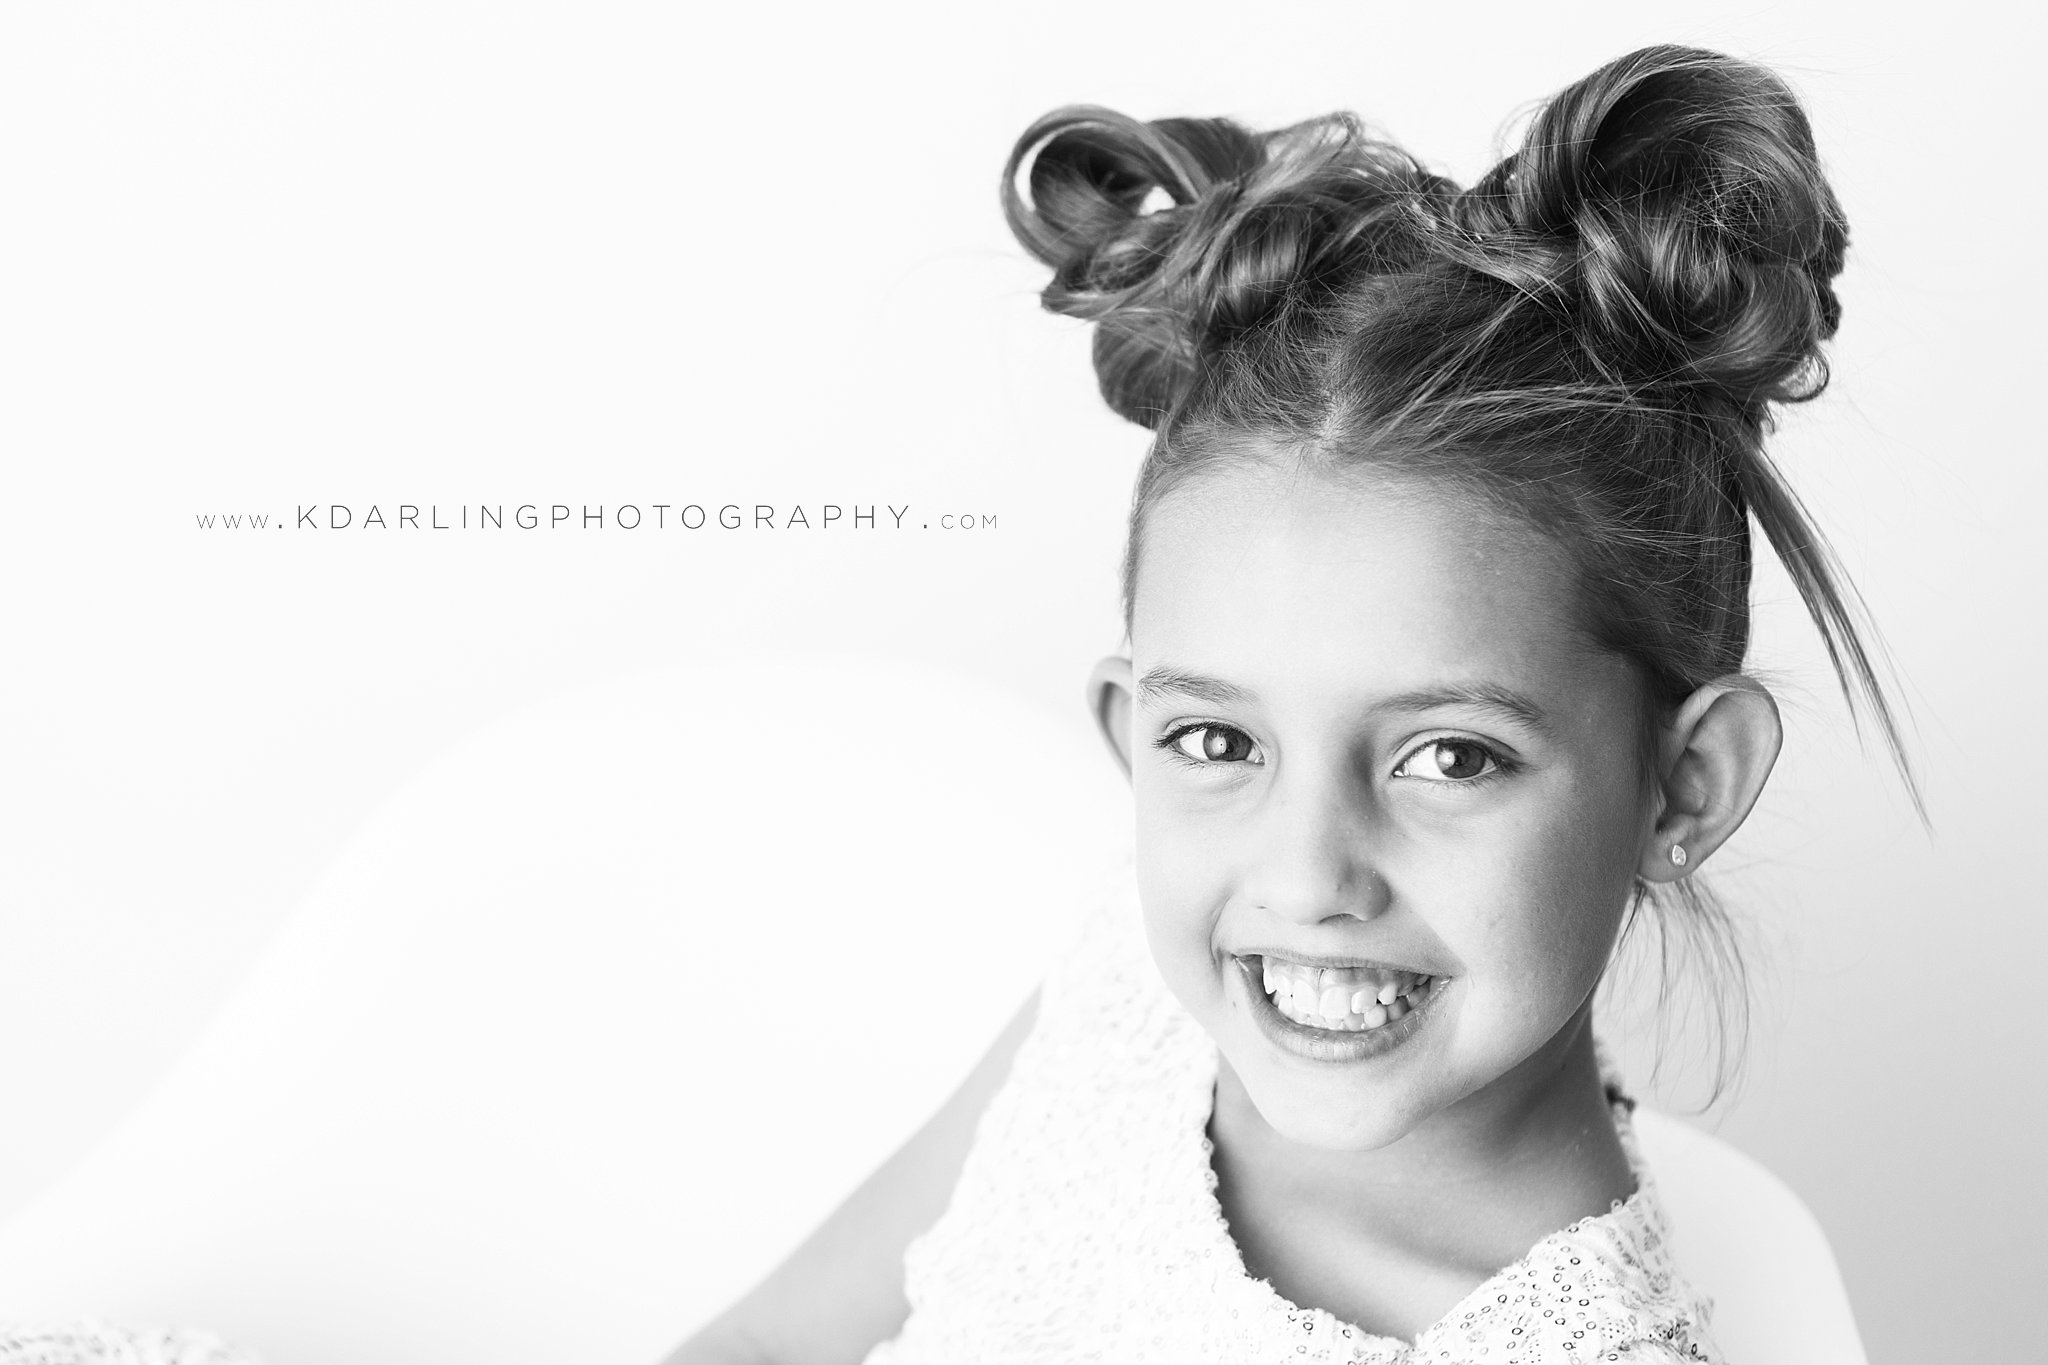 Child-Photographer-portraits-Champaign-County-IL-Fisher-Studio-Darling_0182.jpg